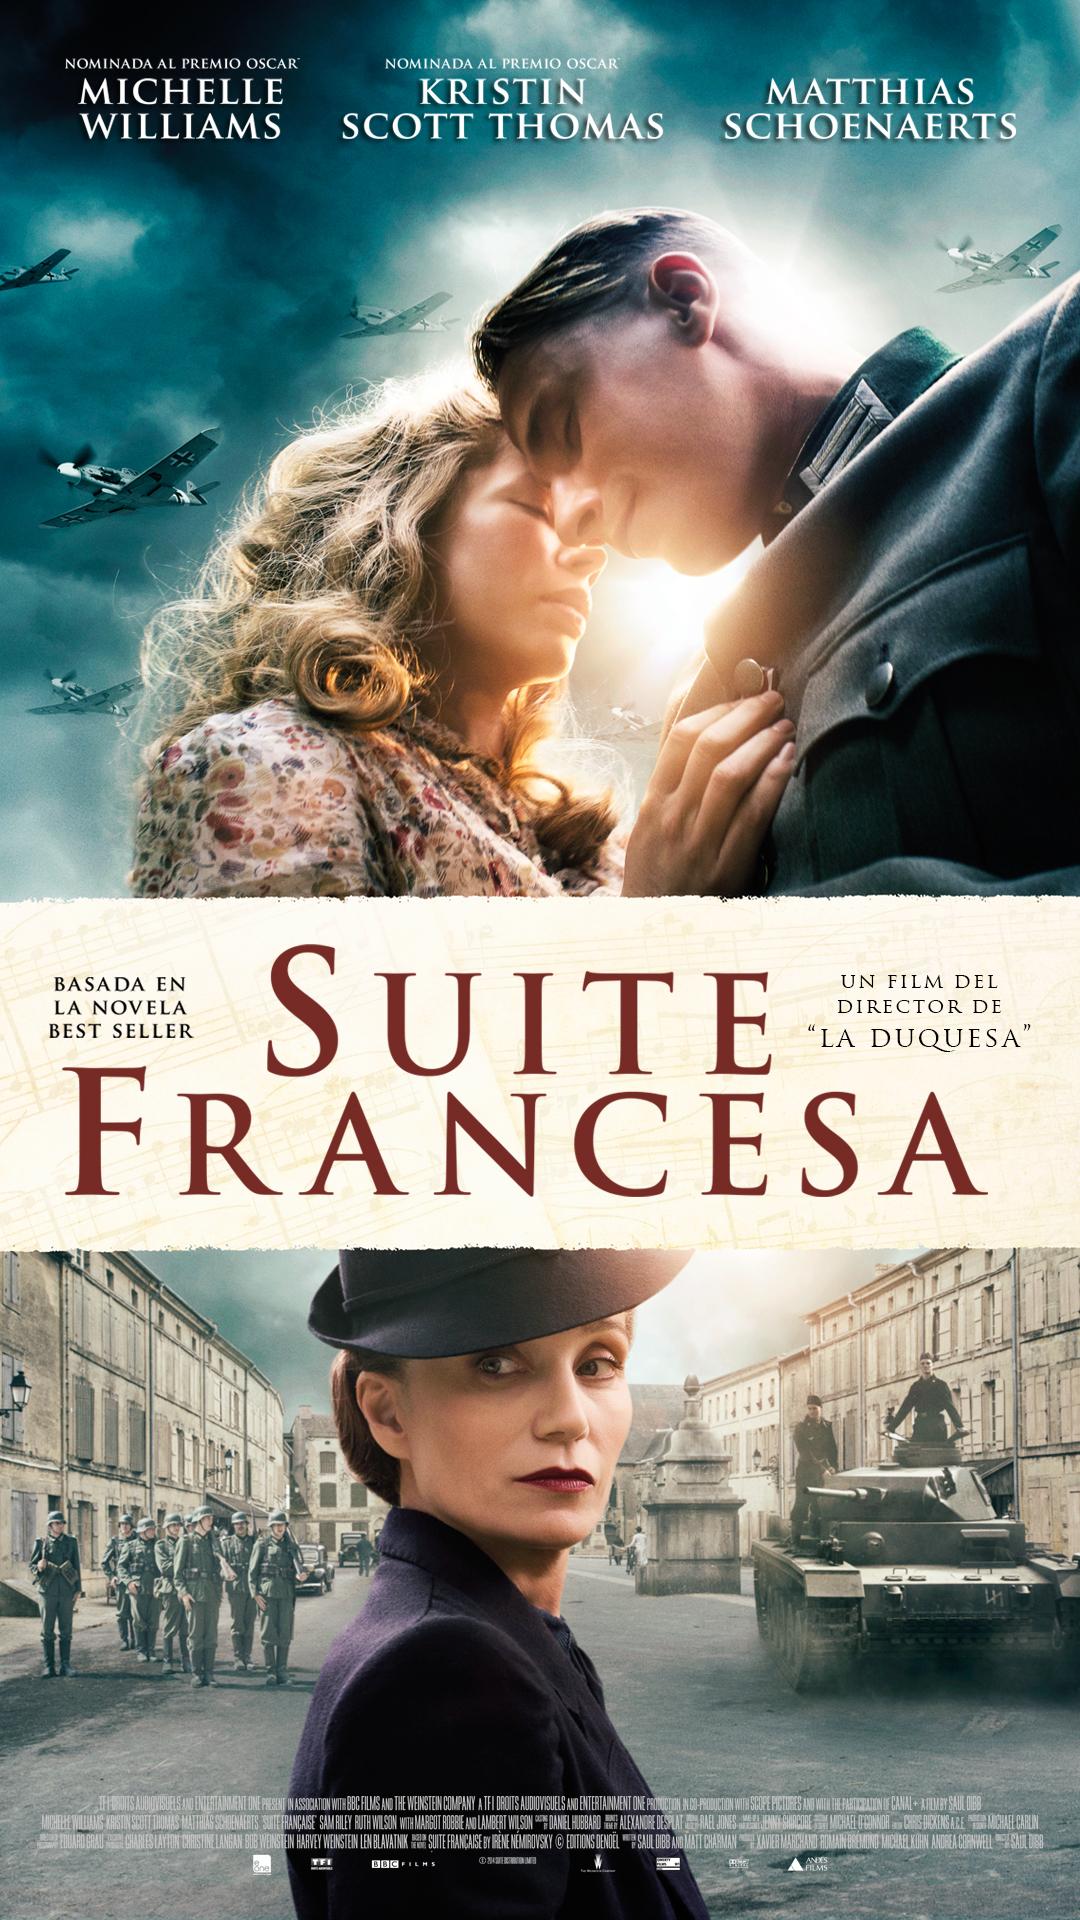 http://www.andesfilms.com.pe/suite-francesa-3112/